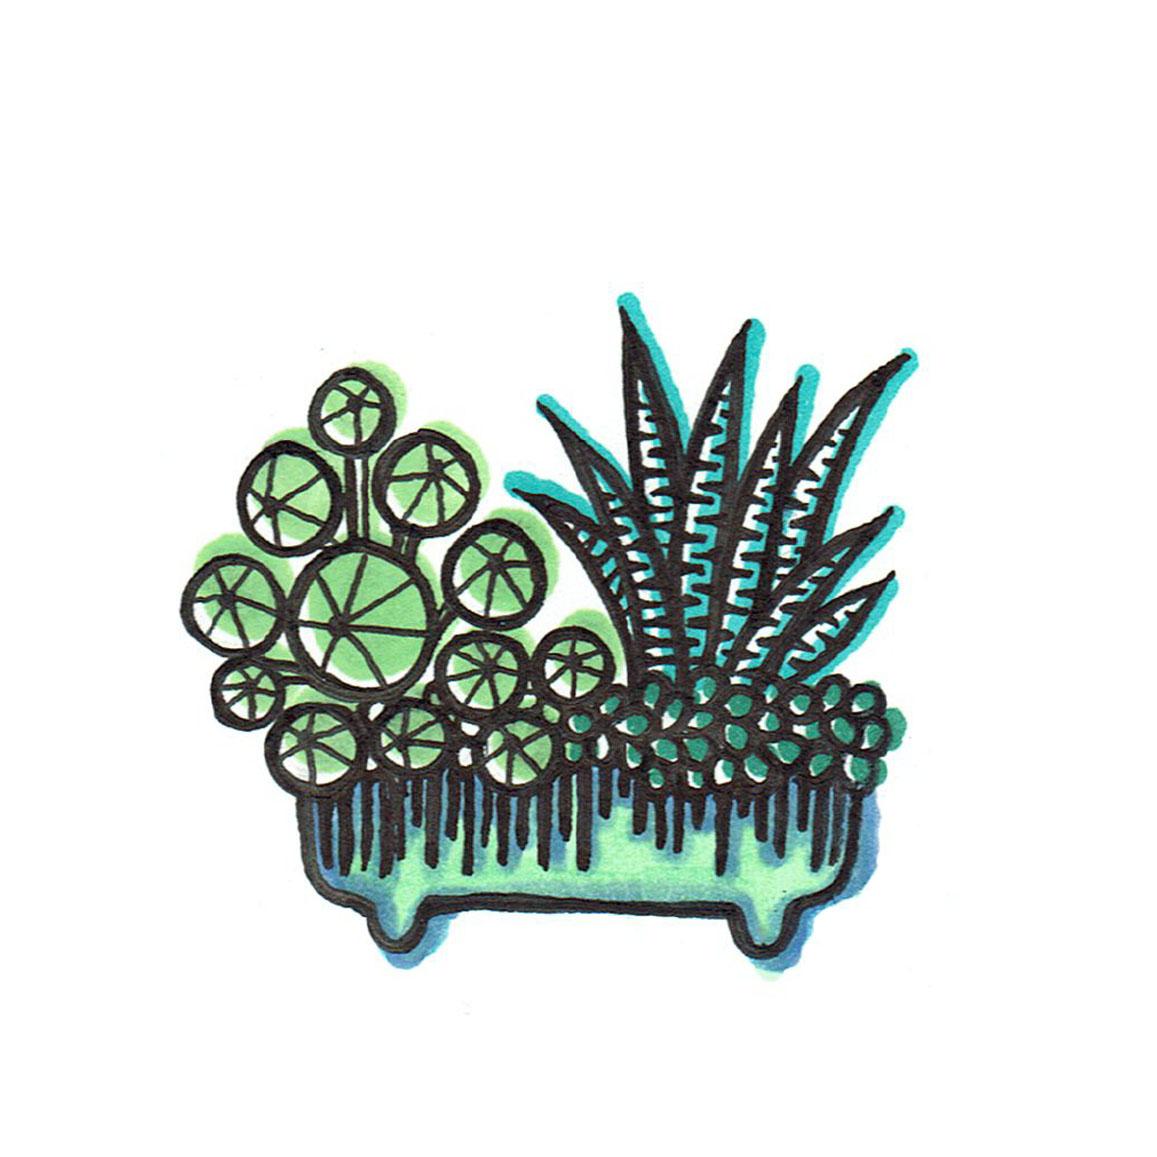 JACQUELINE STORM cactusbakje 4